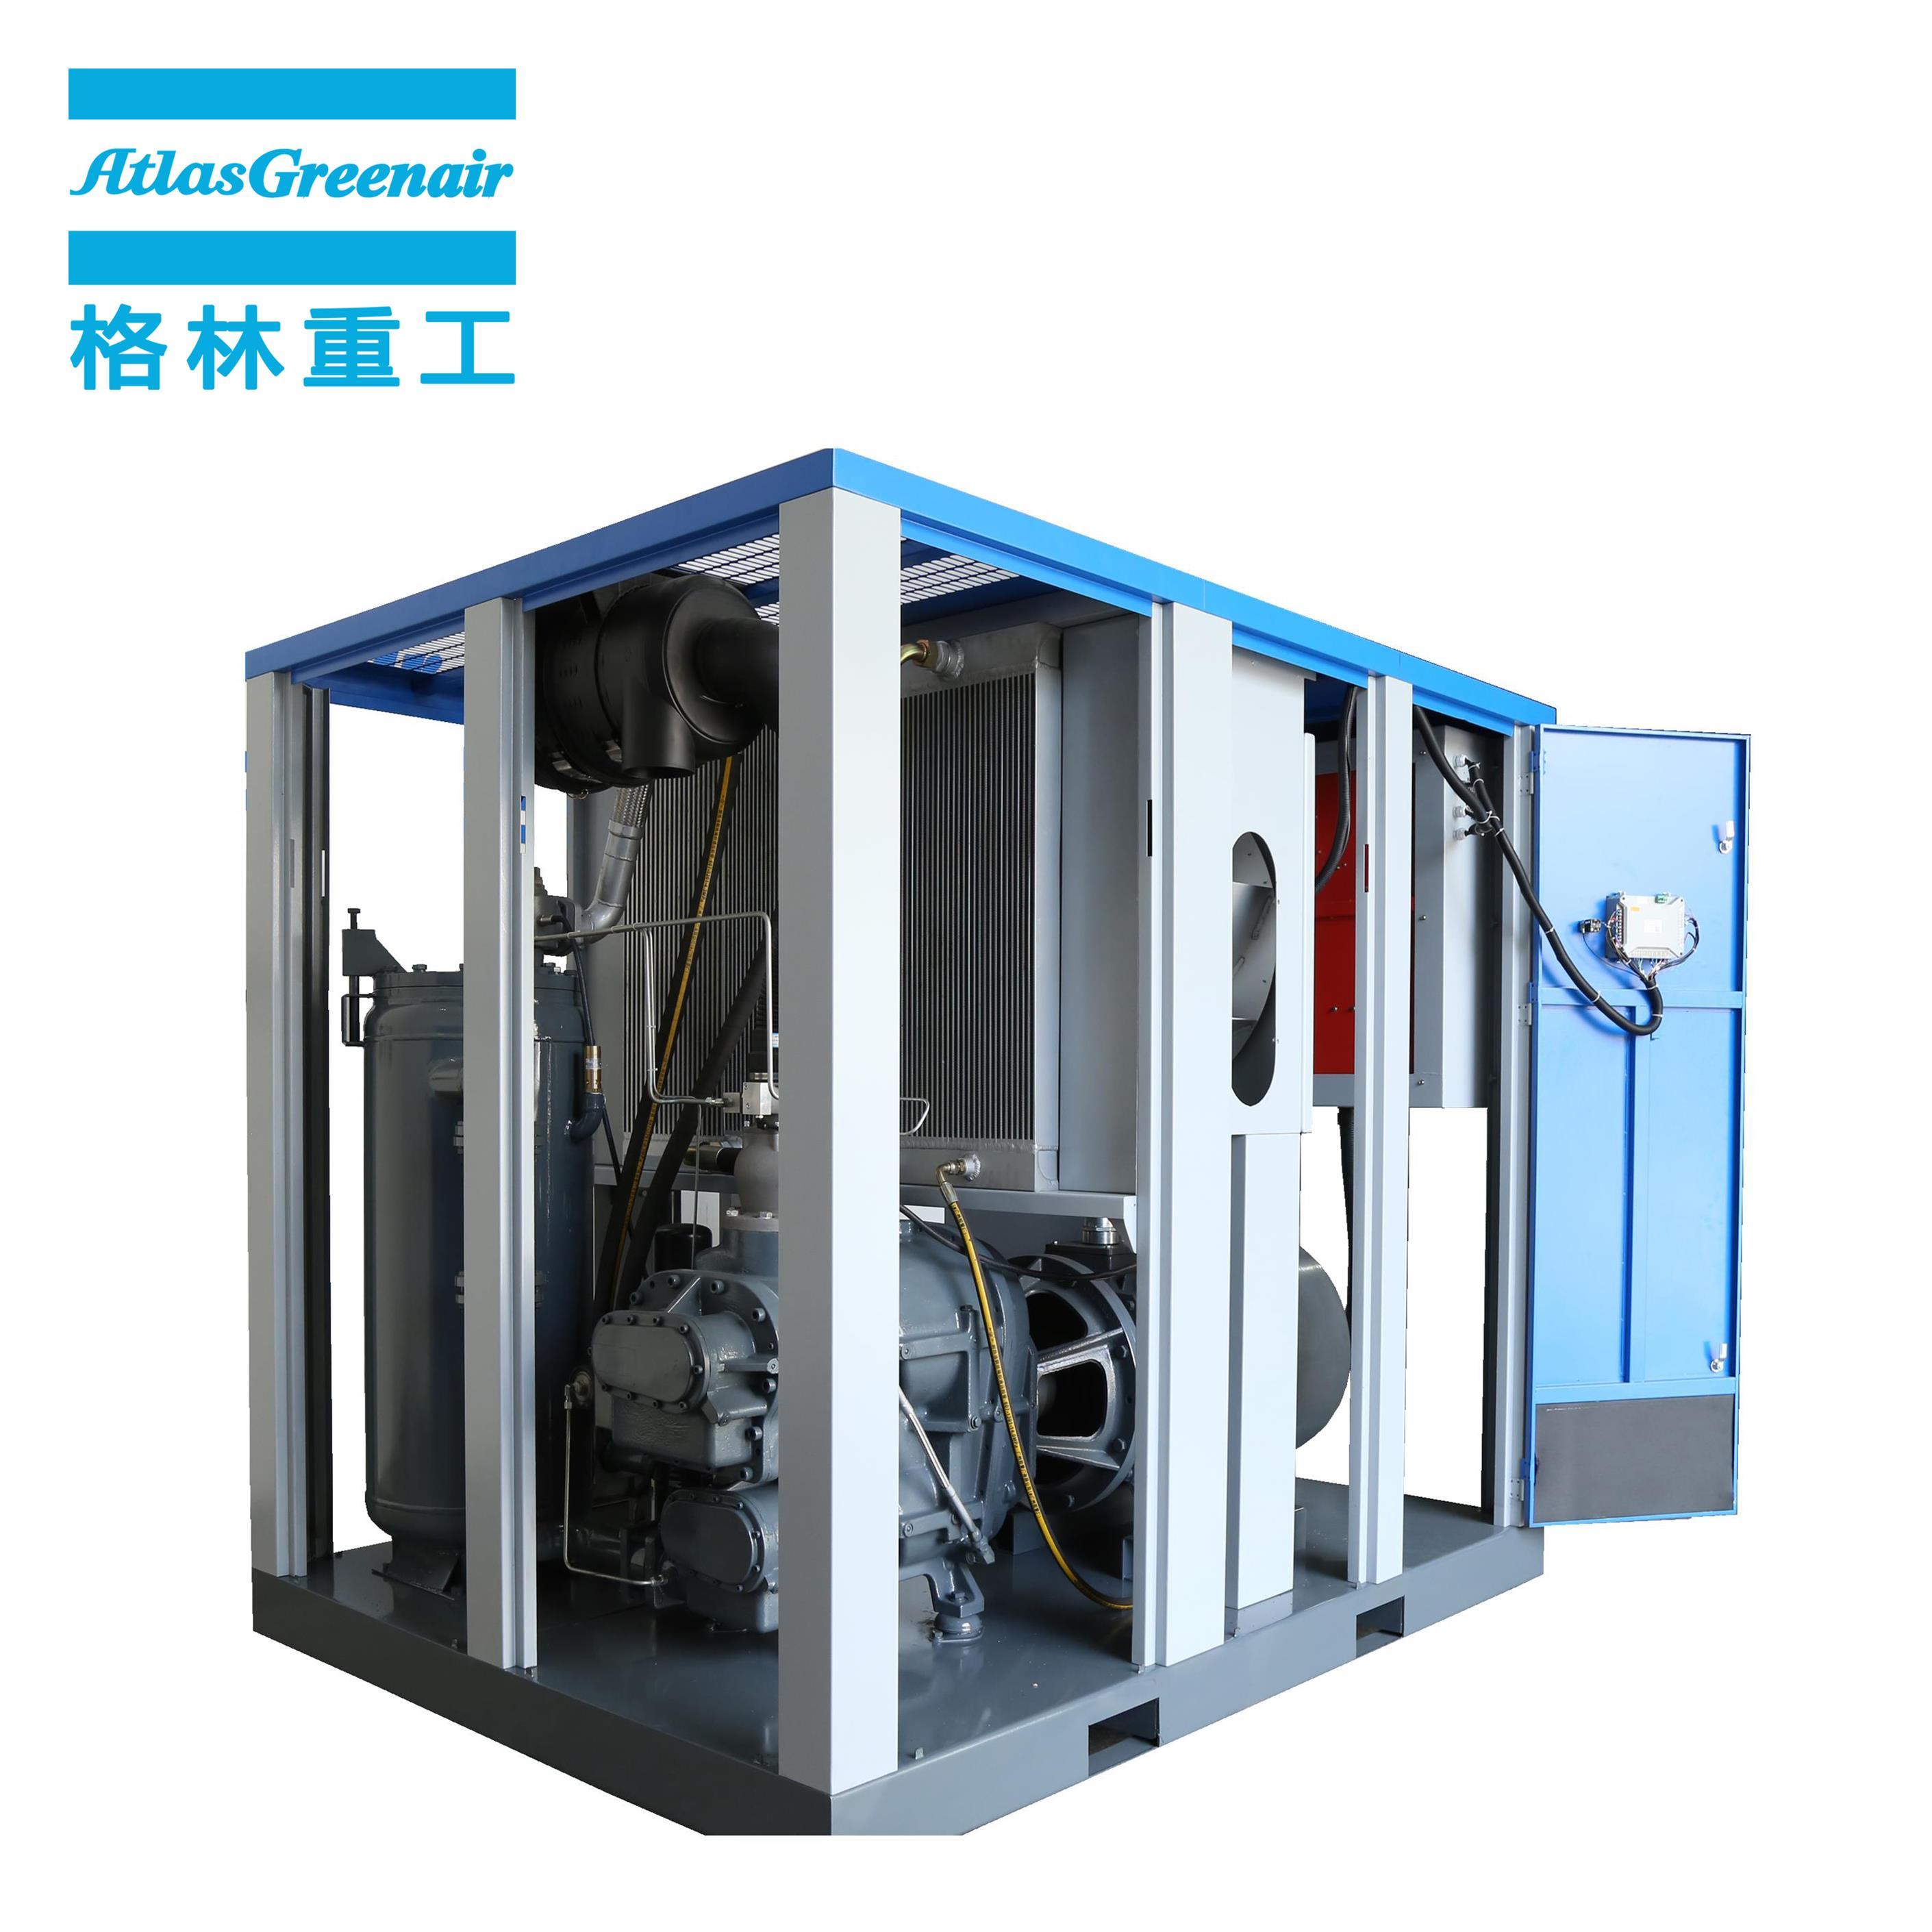 Atlas Greenair Screw Air Compressor variable speed air compressor supplier for sale-2